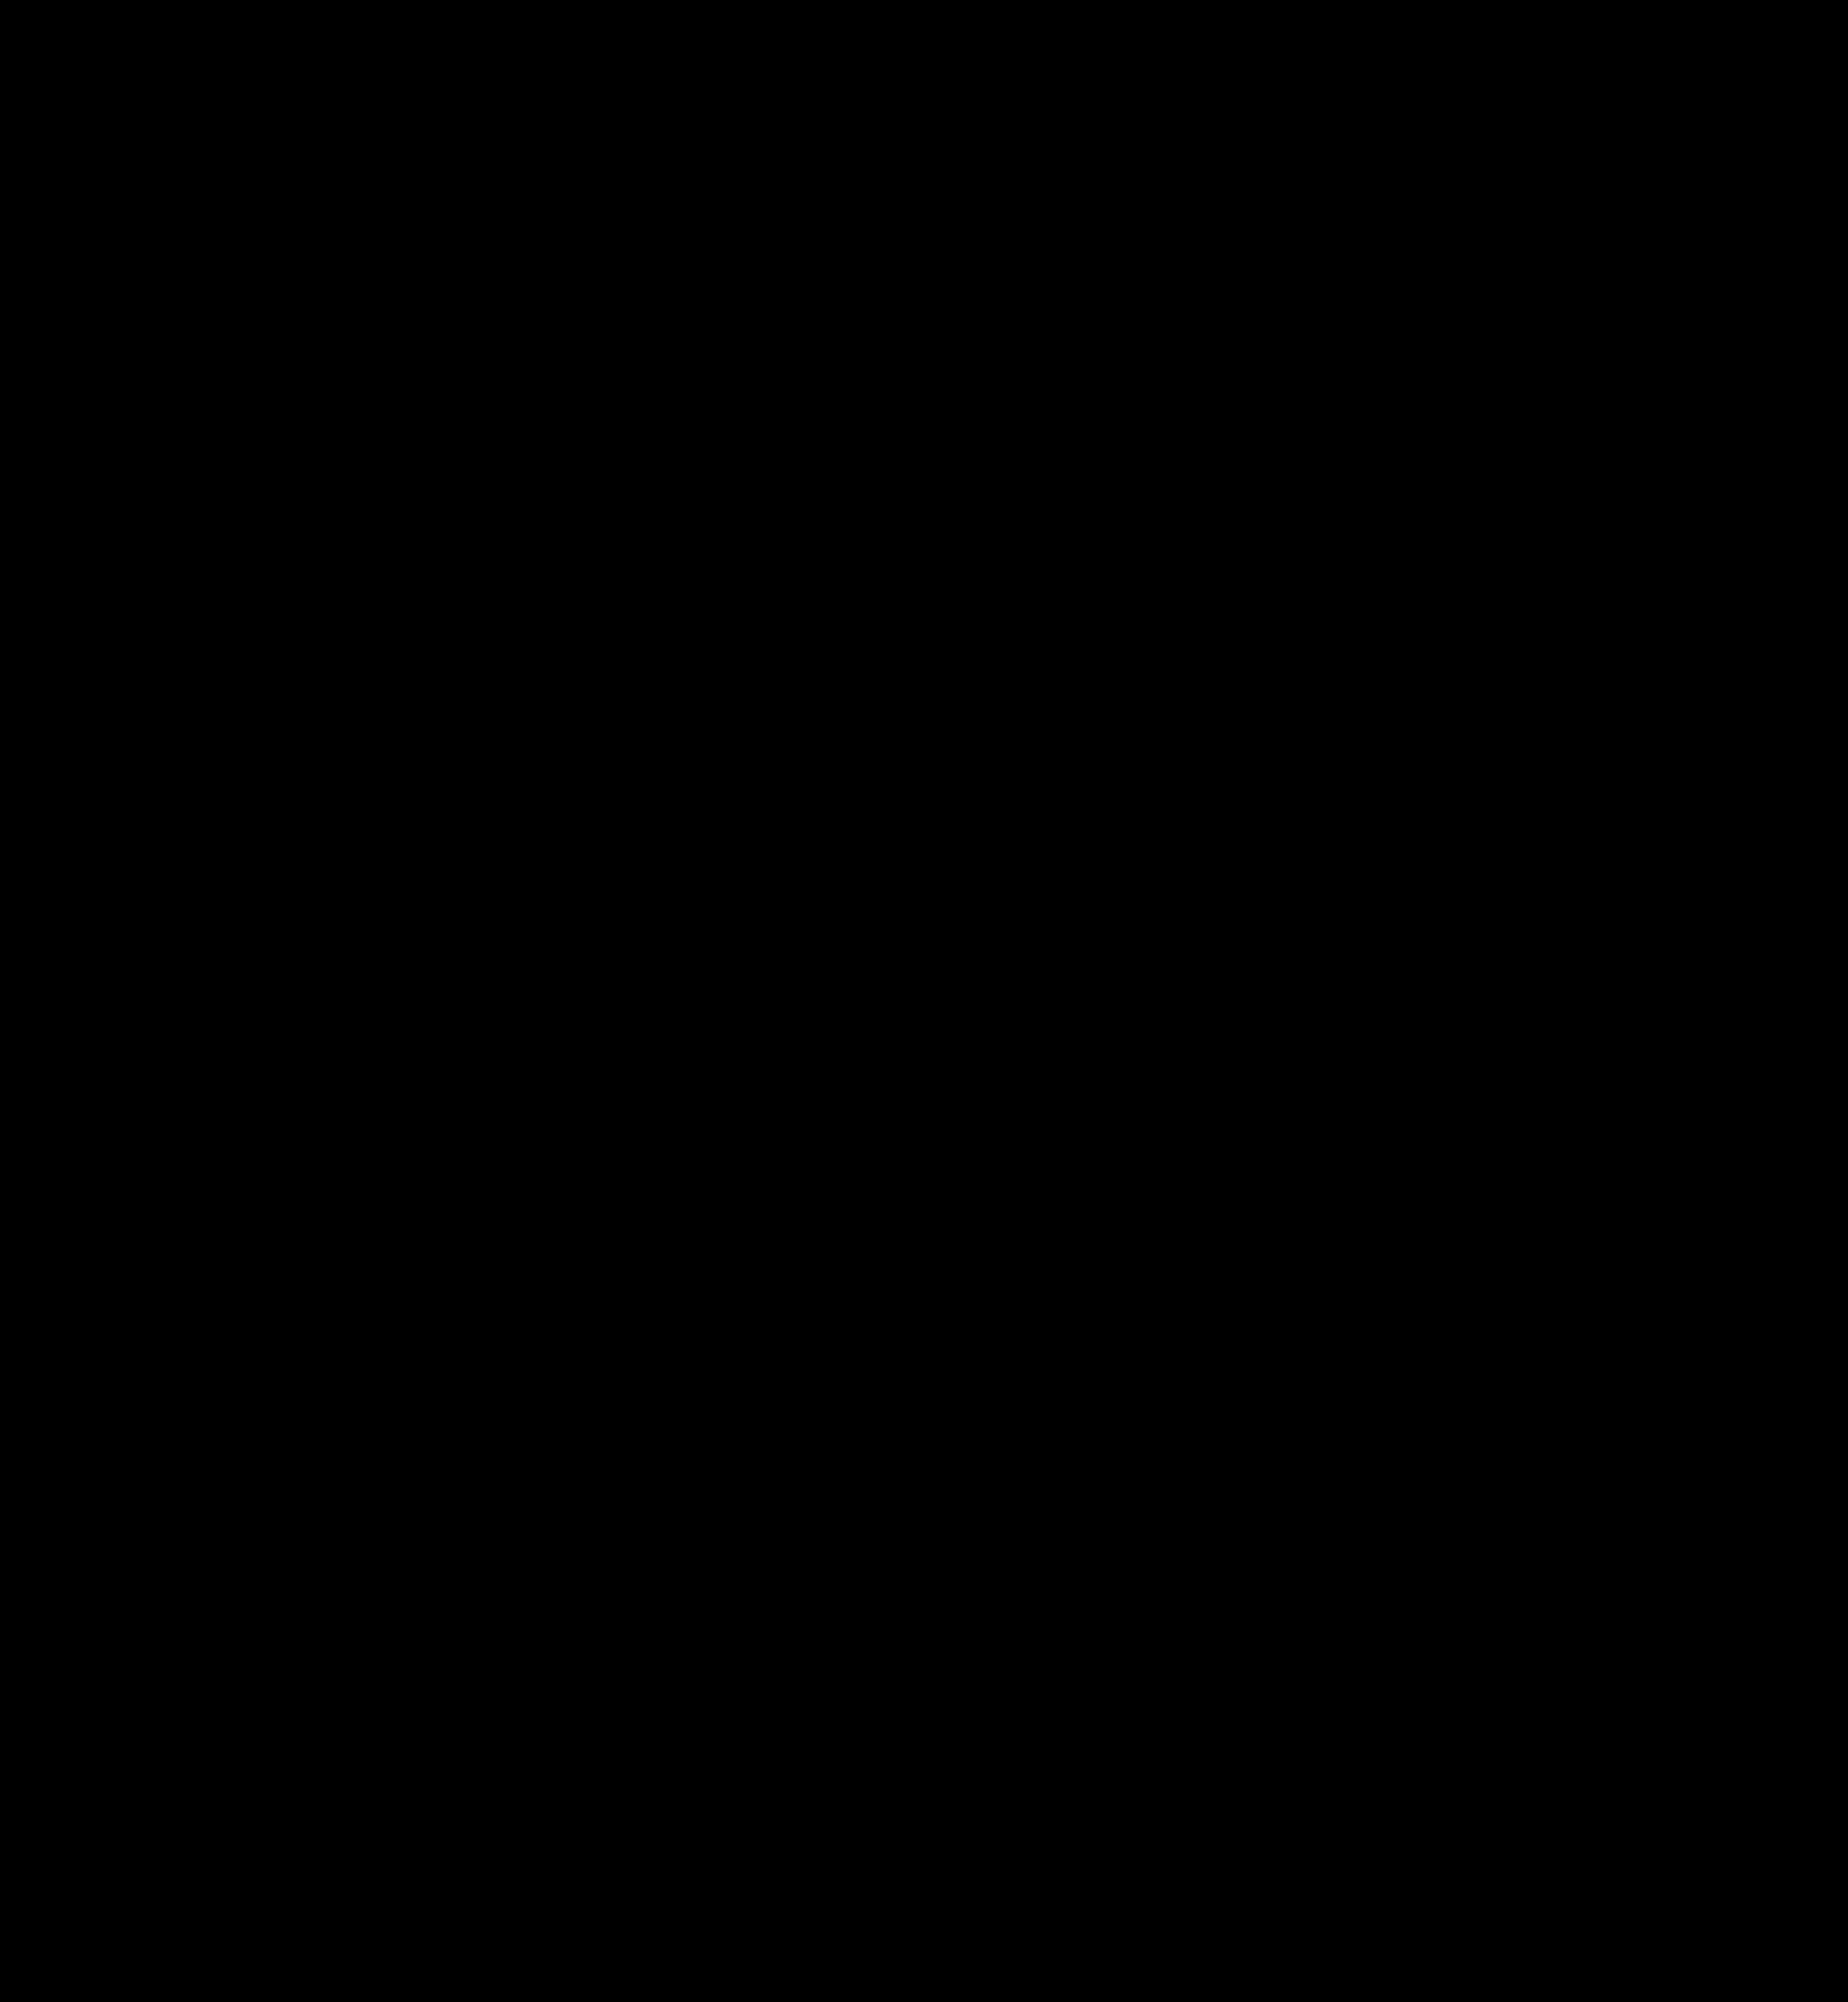 Pik png 7 » PNG Image.